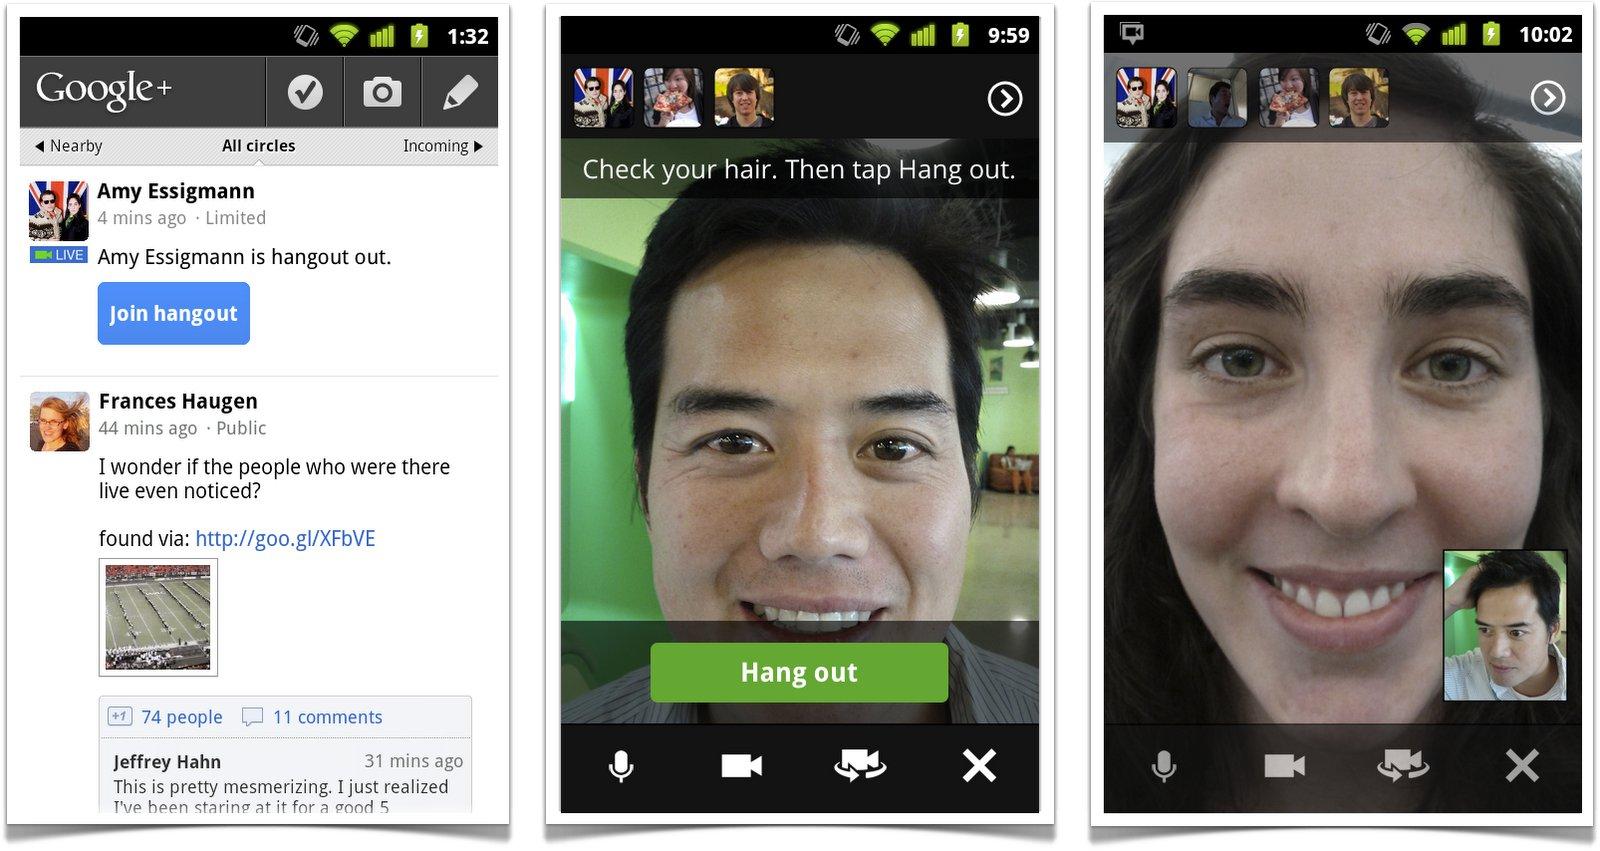 Google Hangoust l'alternativa più valida a Skype